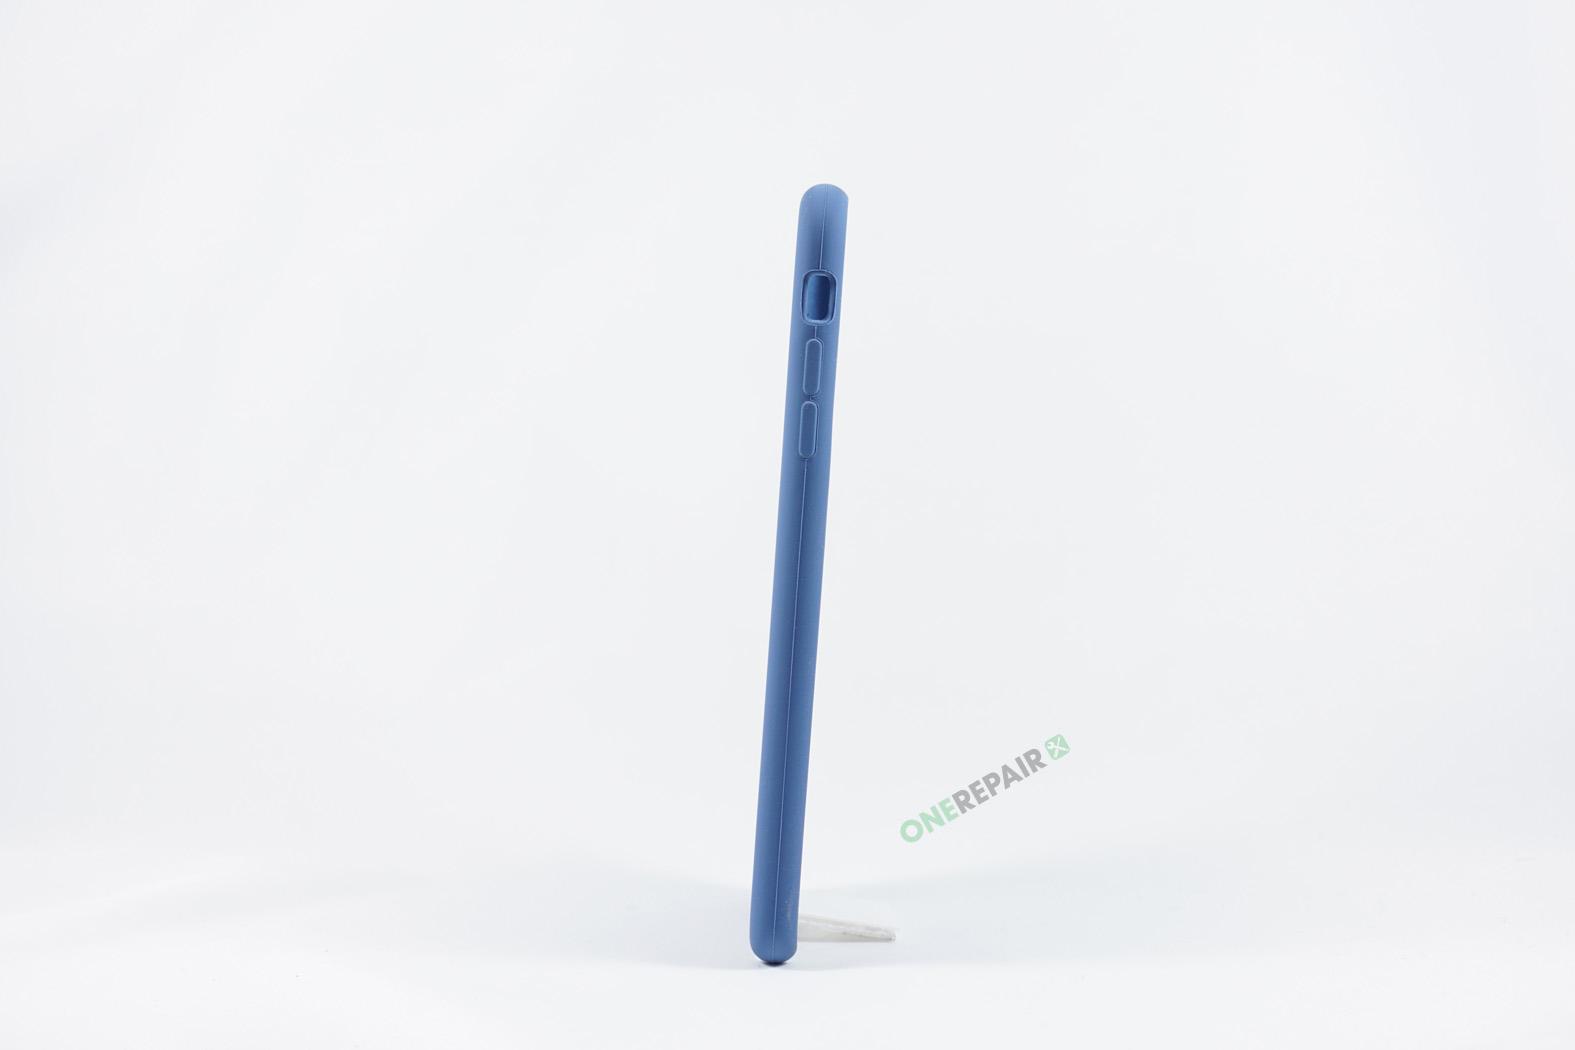 351432_iPhone_6+_6S+_Plus_Silikone_Cover_Blaa_OneRepair_WM_00002